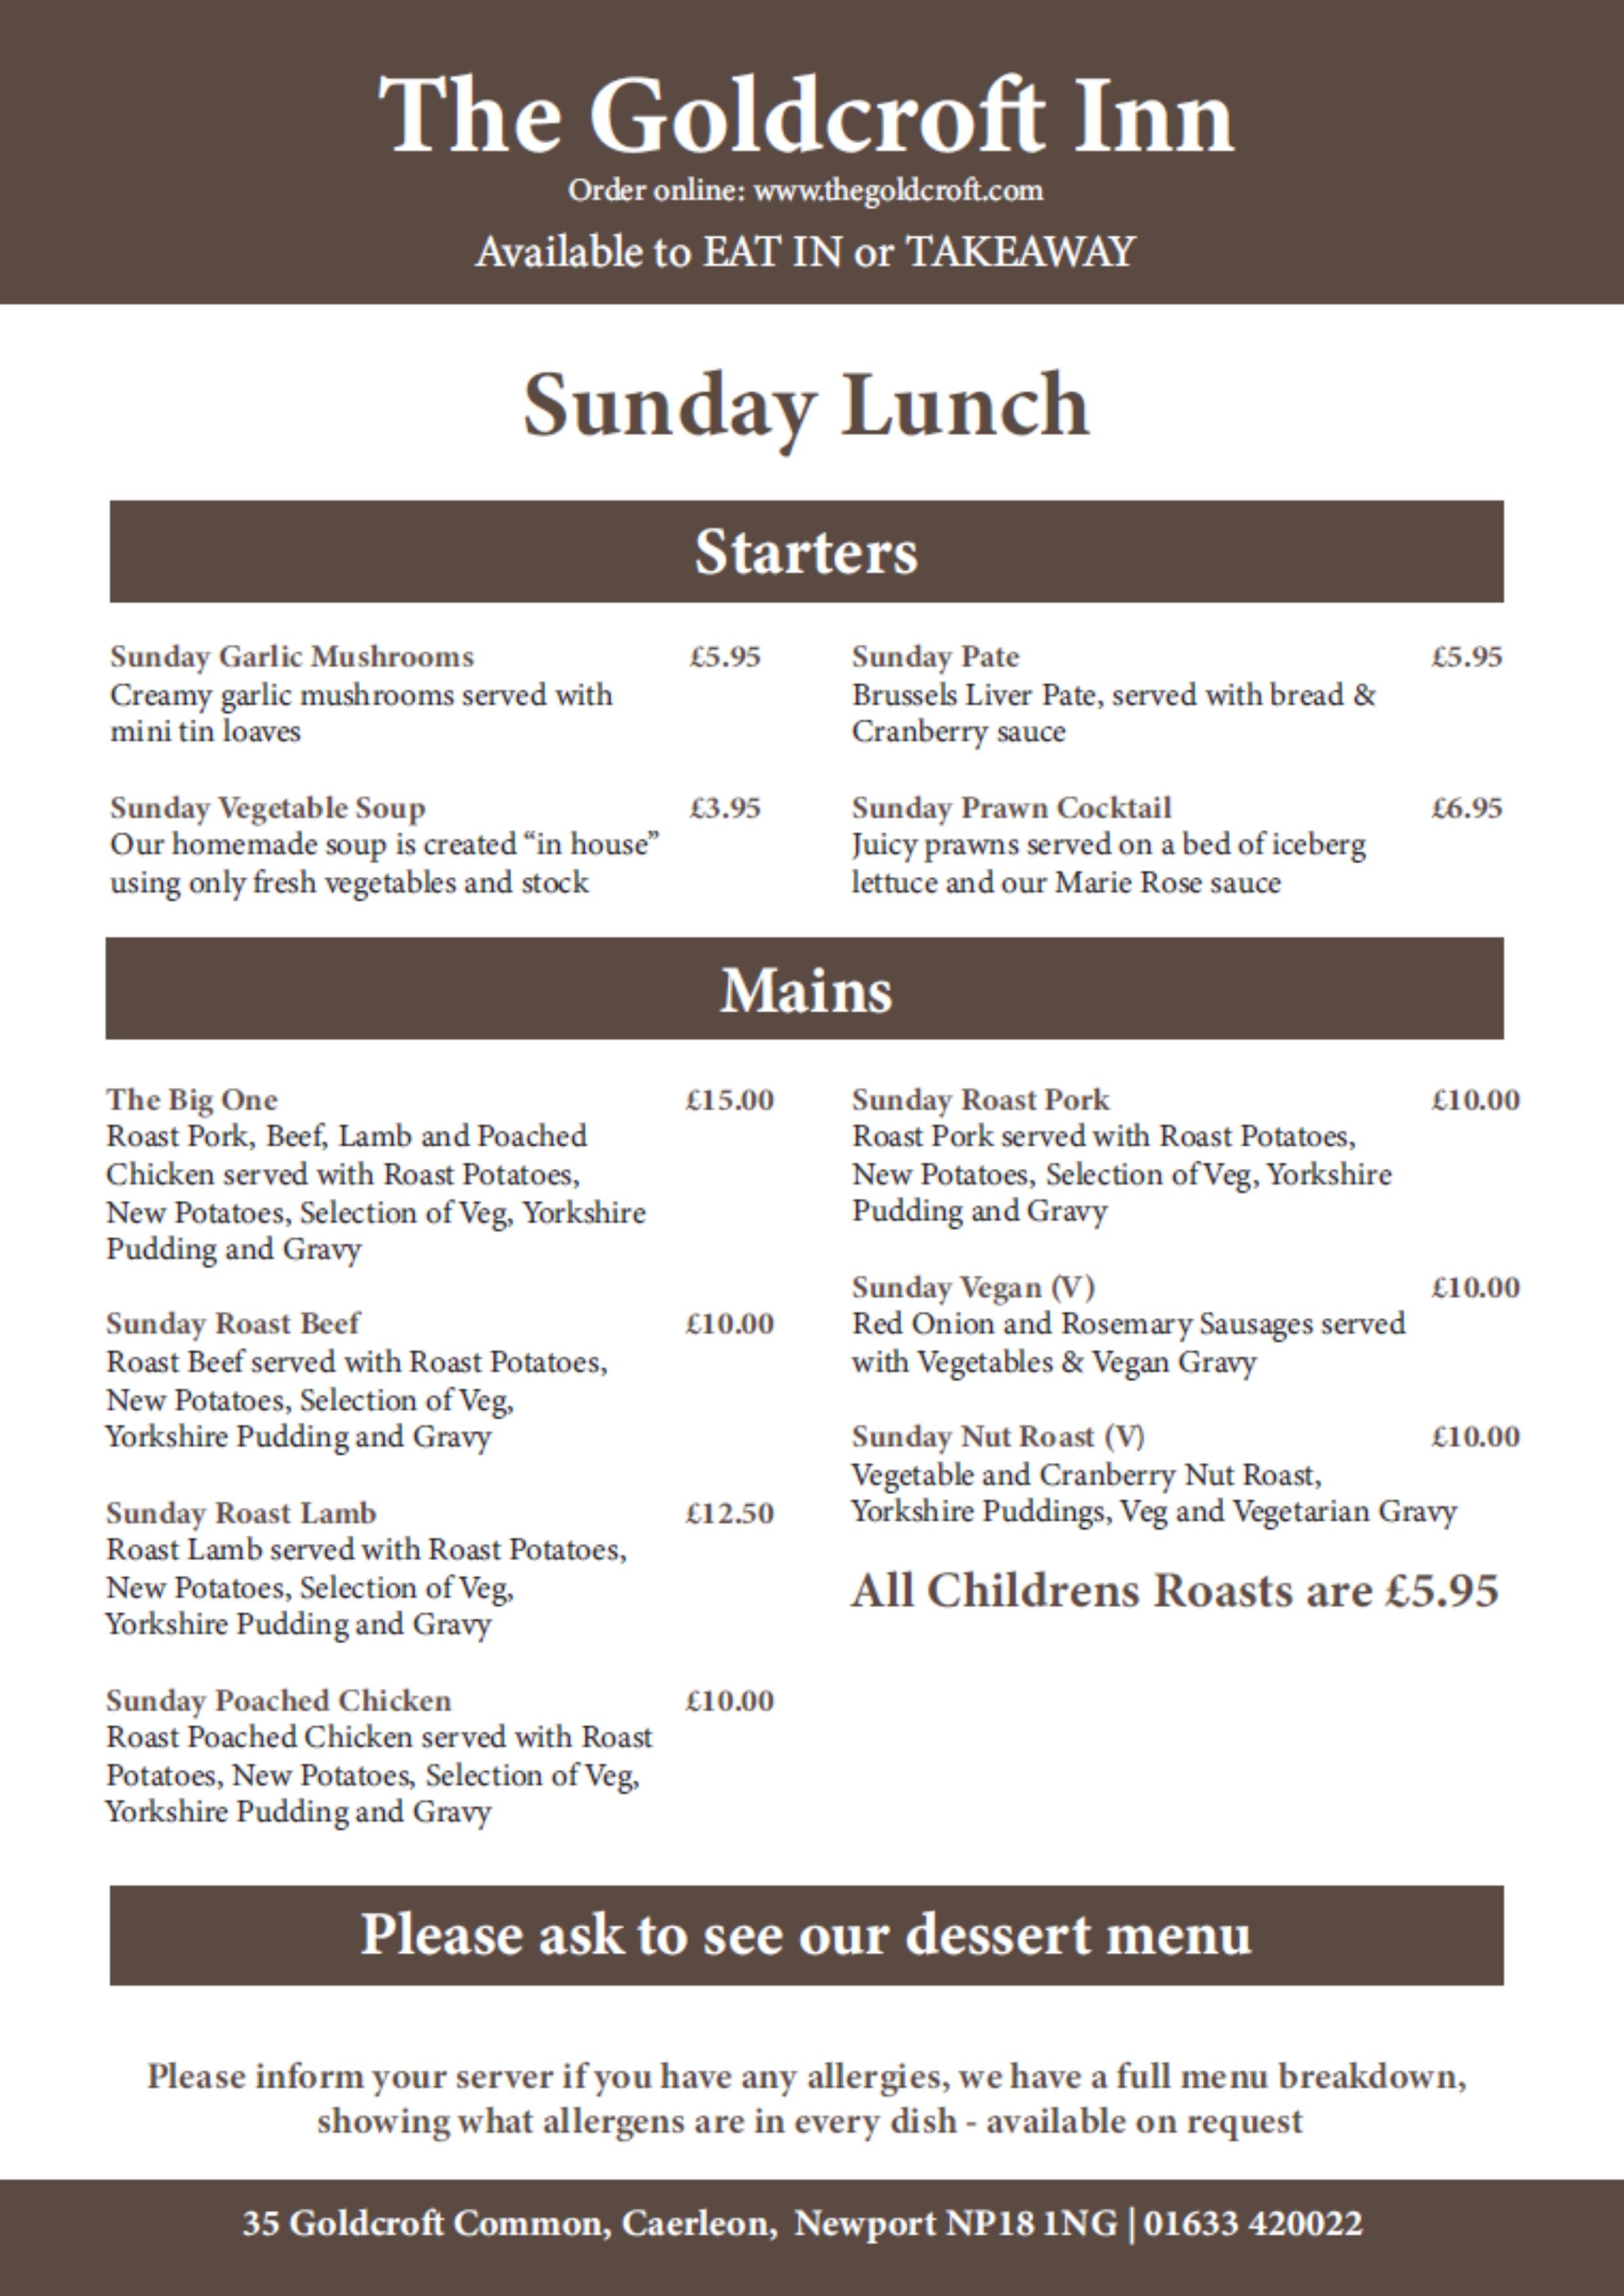 Goldcroft Sunday Lunch